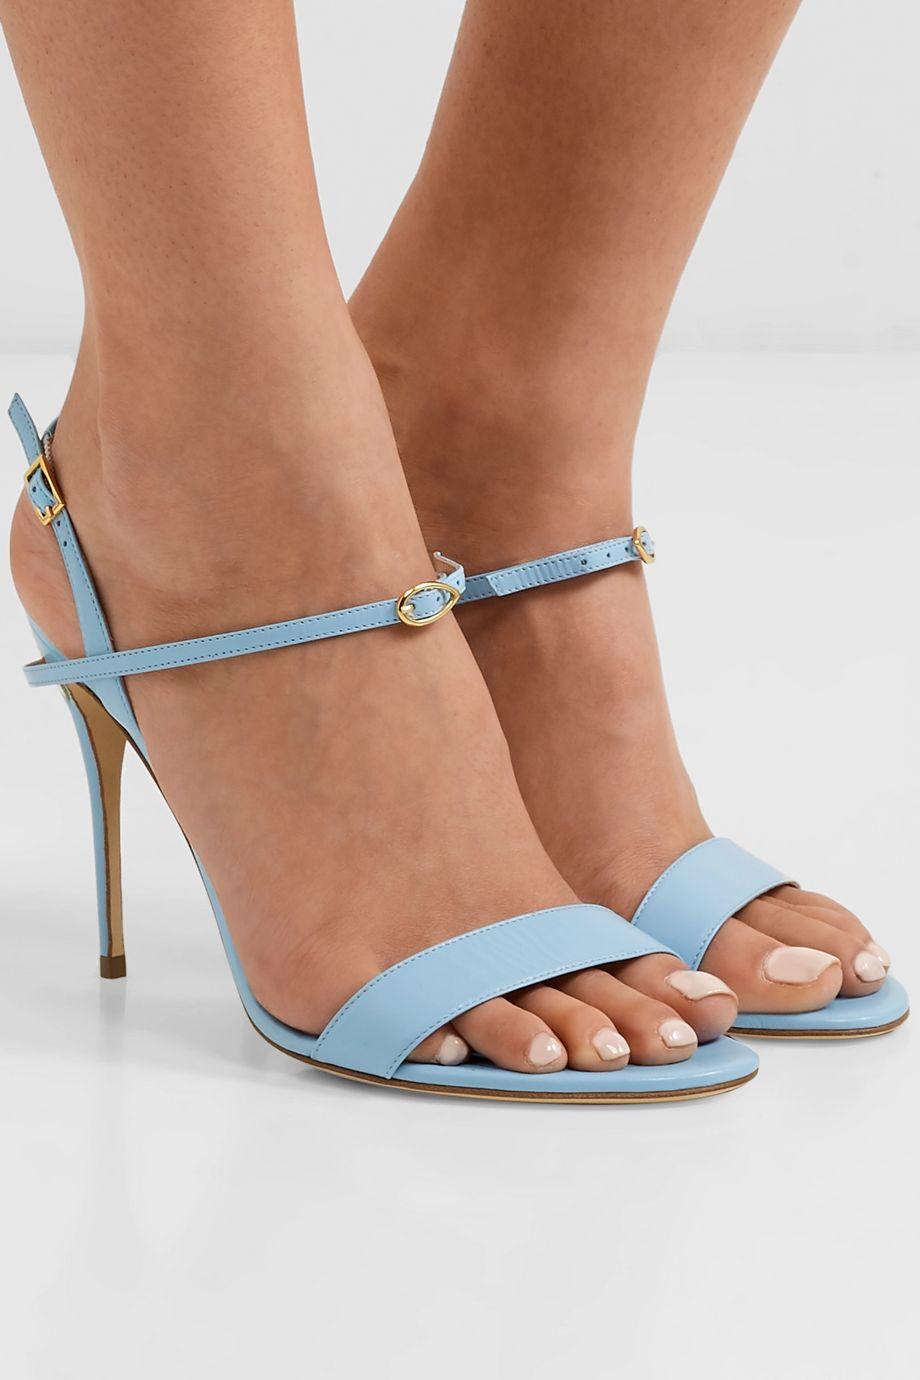 Jennifer Chamandi Tommaso 105 leather slingback sandals